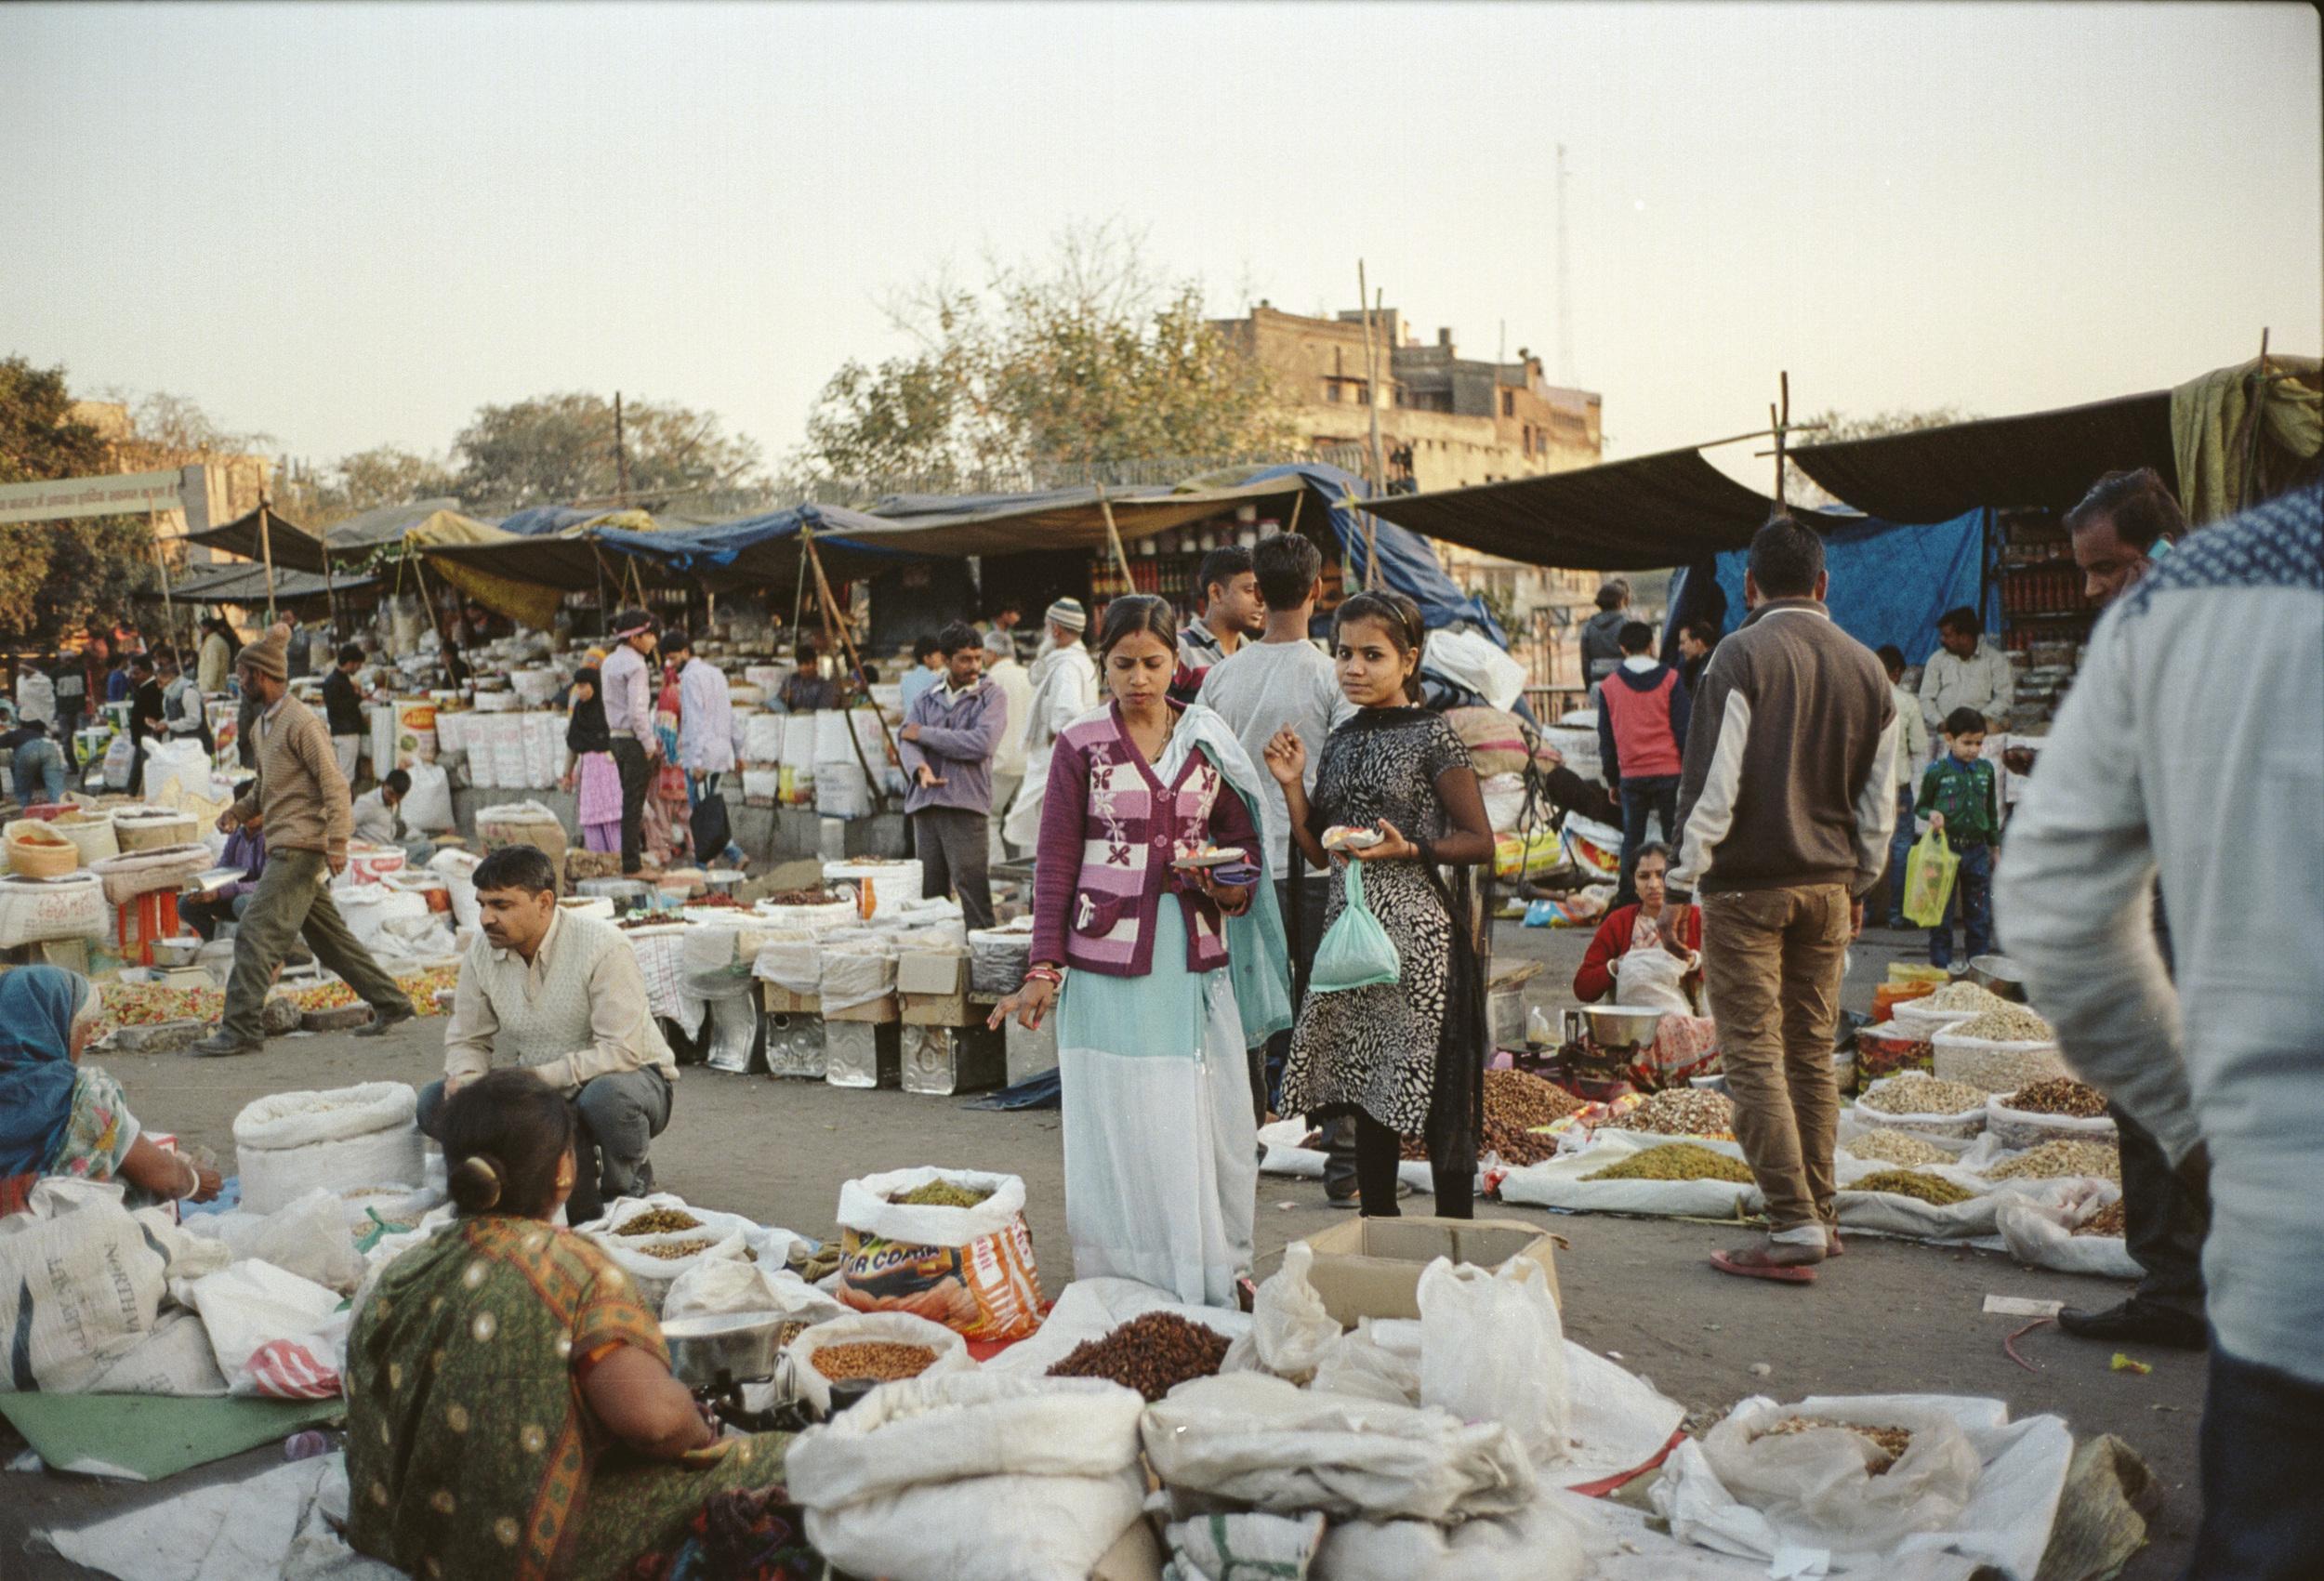 72-F34_Spice Market, Delhi, India 2016-4.jpg